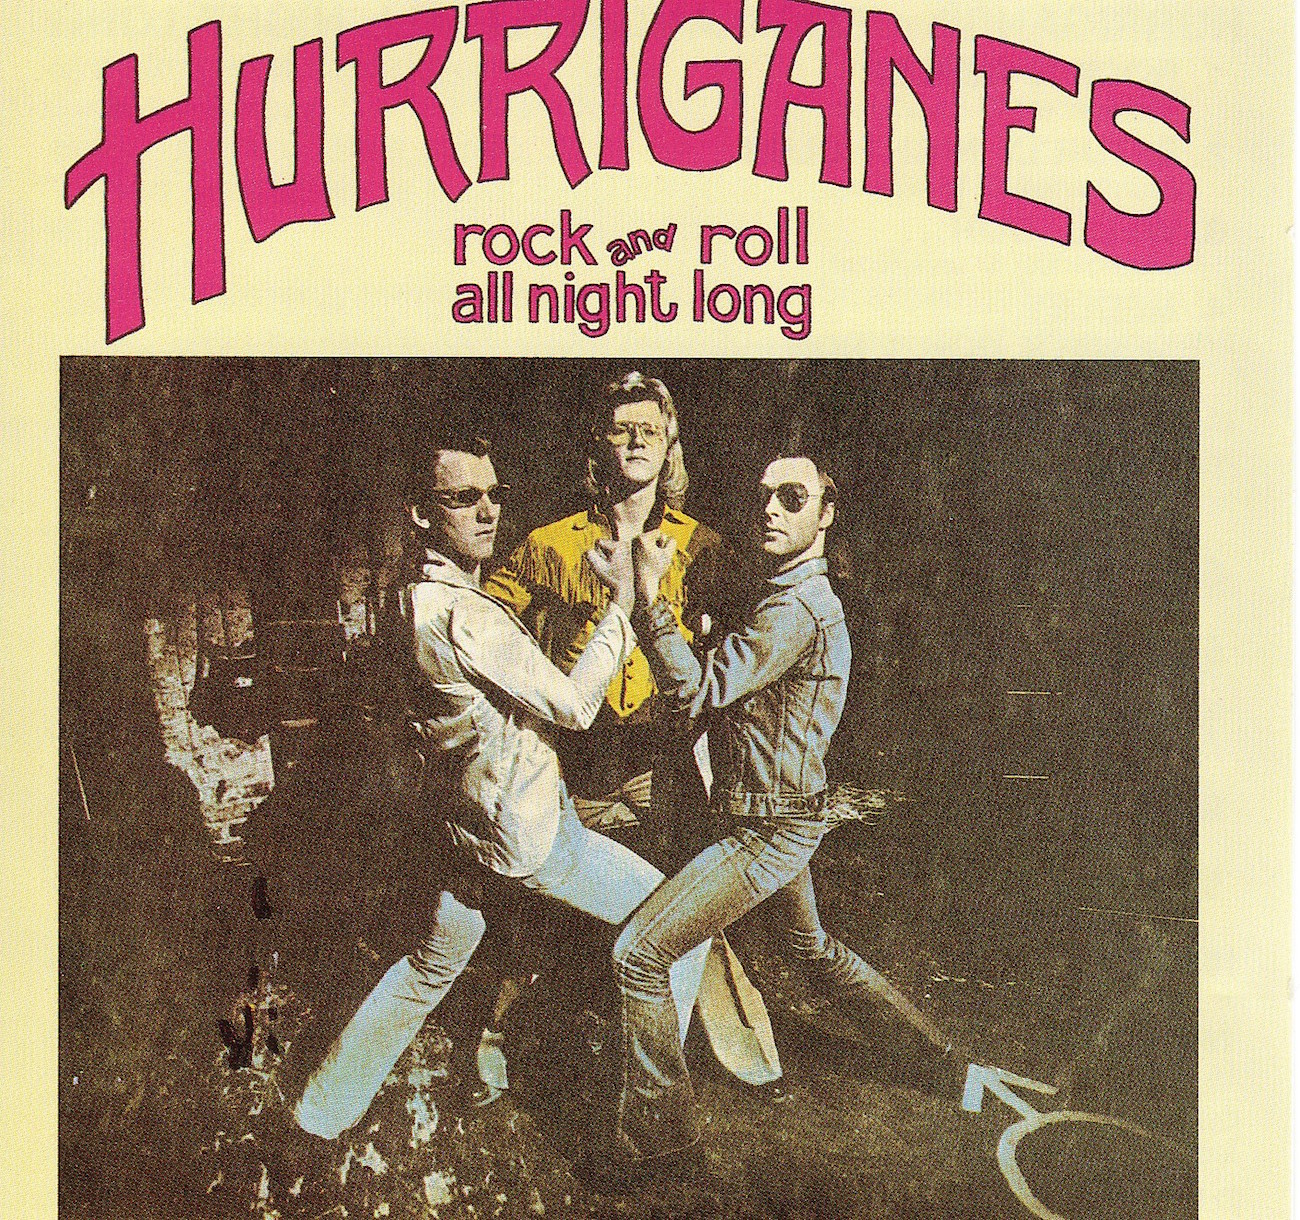 Hurriganes Front